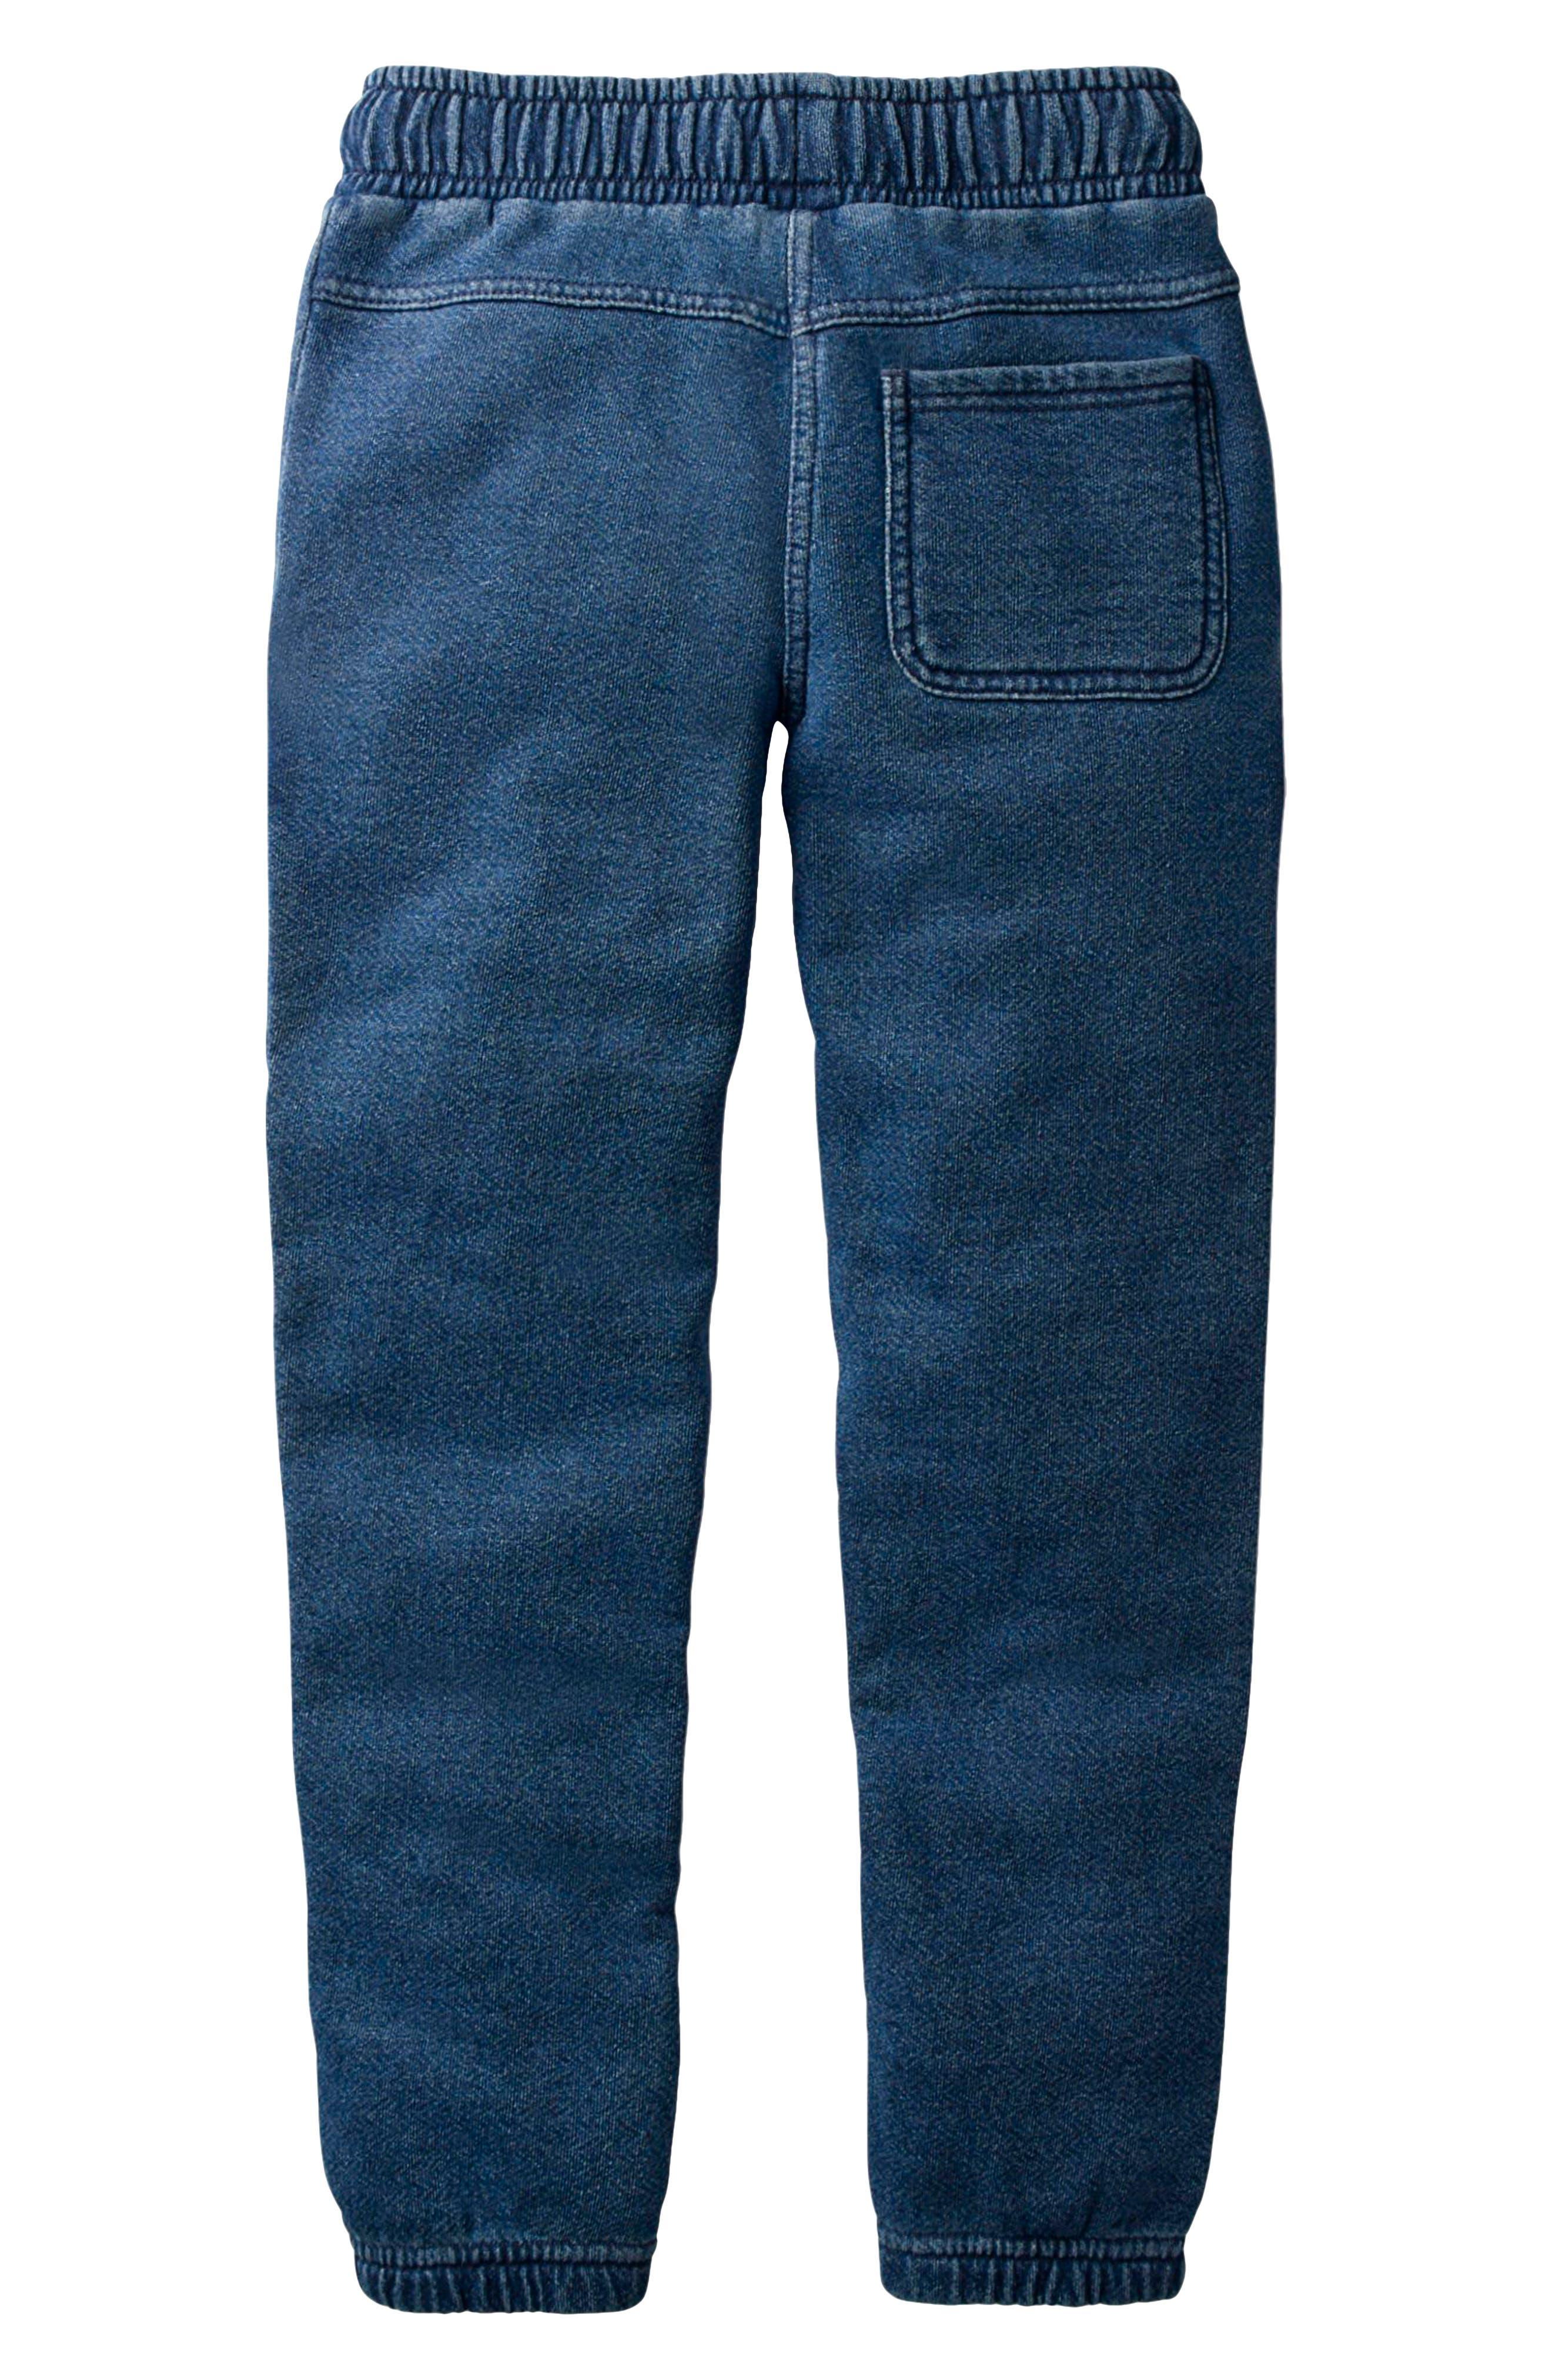 Jogger Pants,                             Alternate thumbnail 2, color,                             Indigo Blue